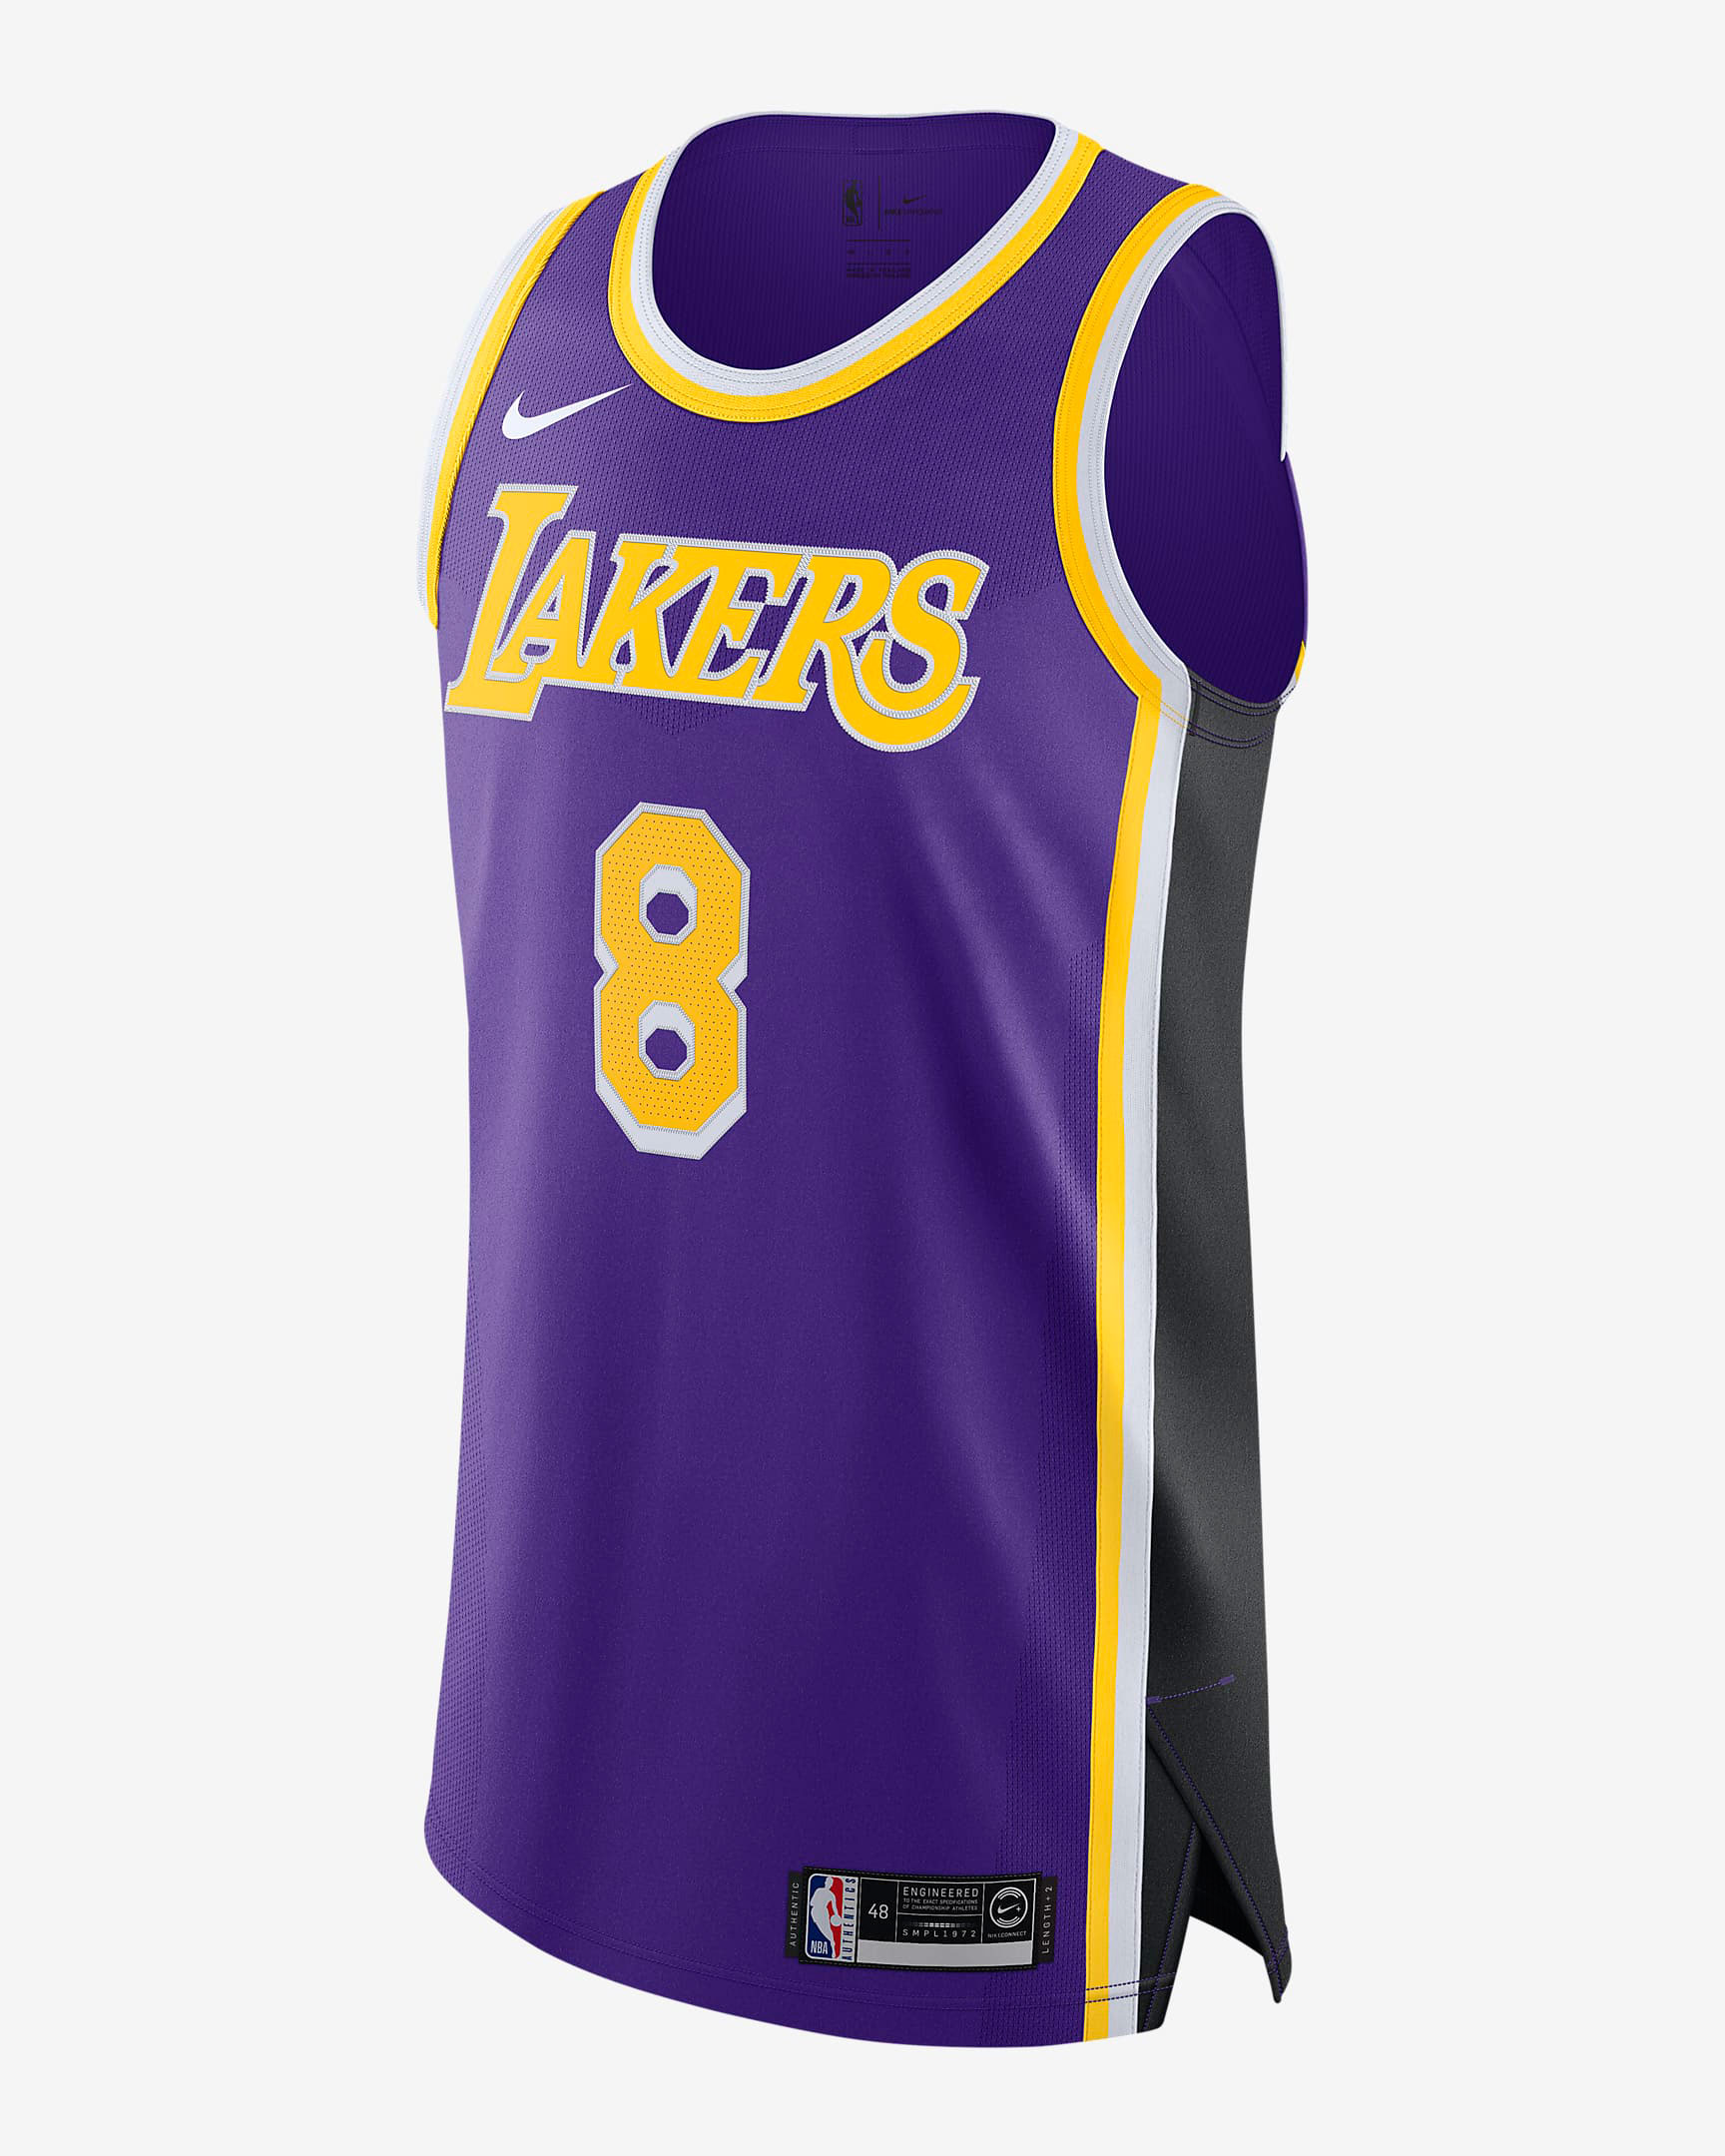 kobe-bryant-lakers-nike-purple-statement-edition-jersey-front